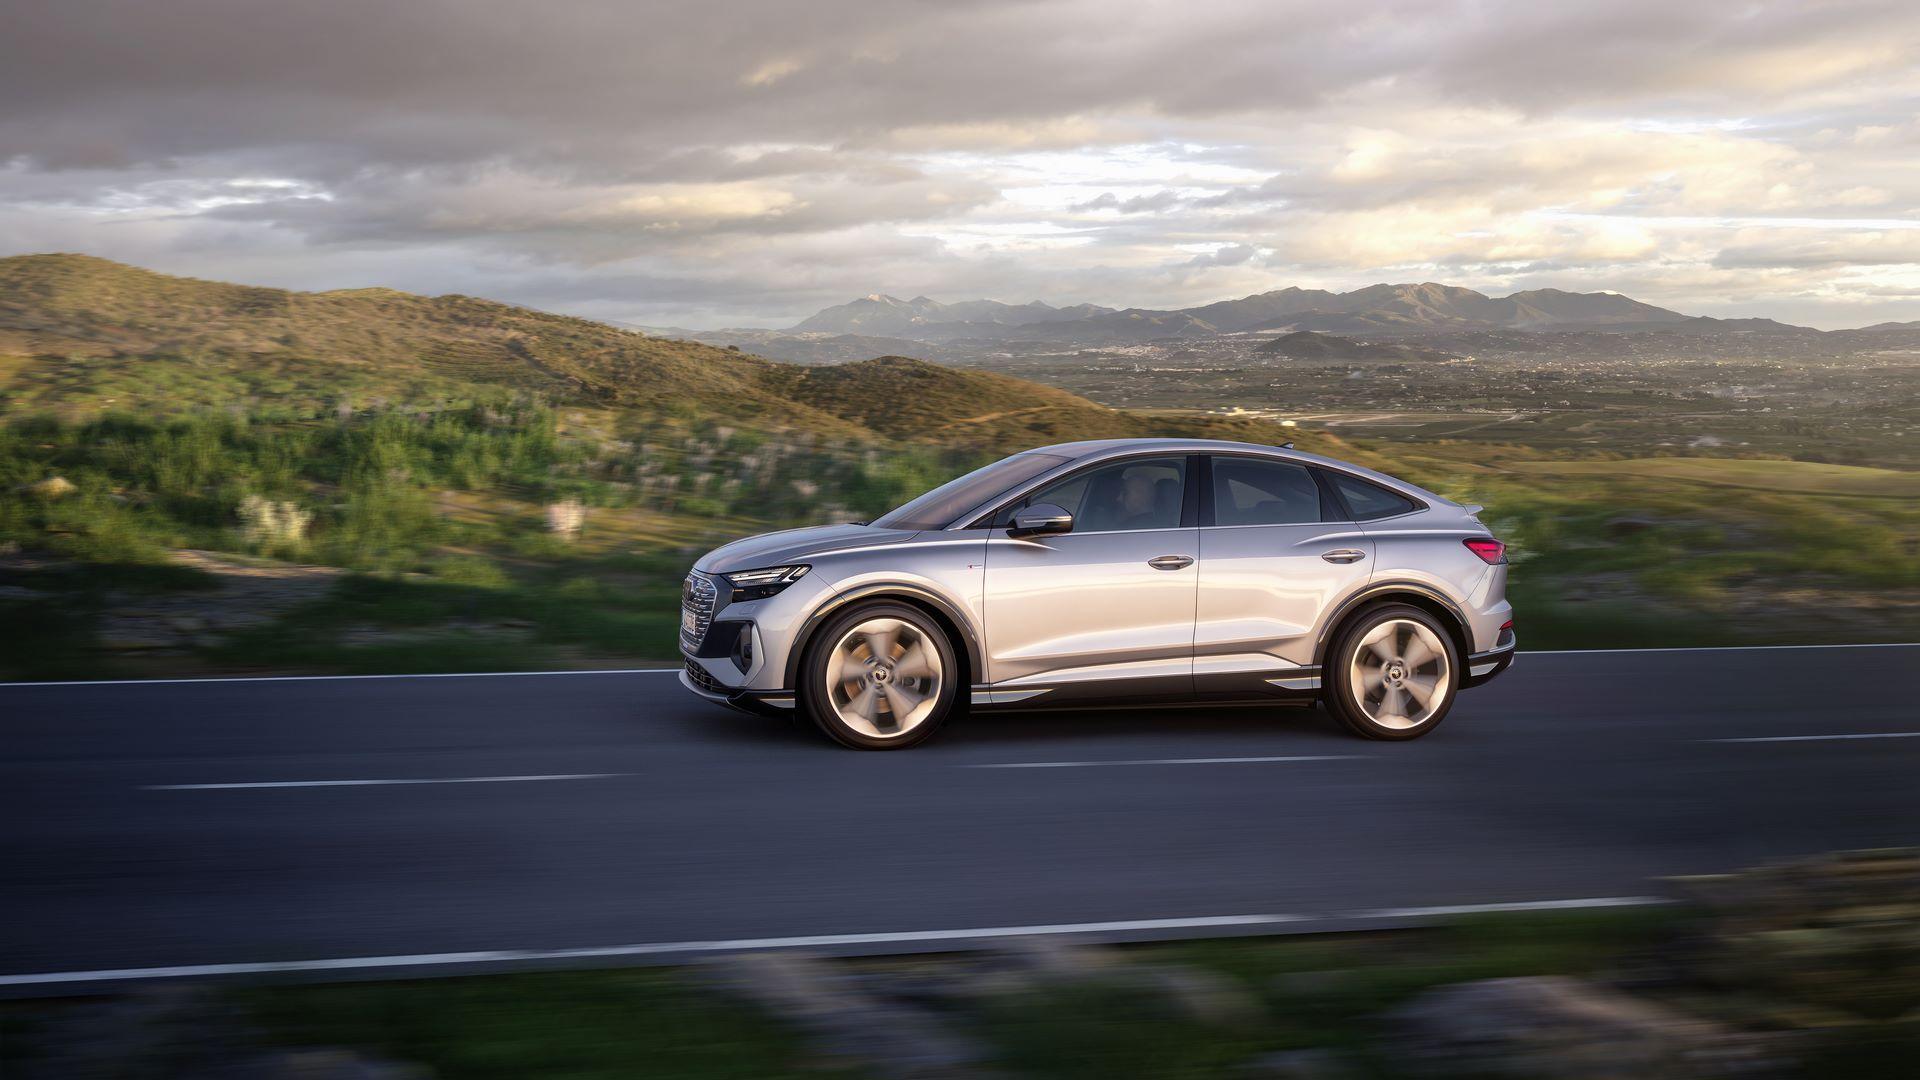 Audi-Q4-e-tron-and-Q4-e-tron-Sportback-41